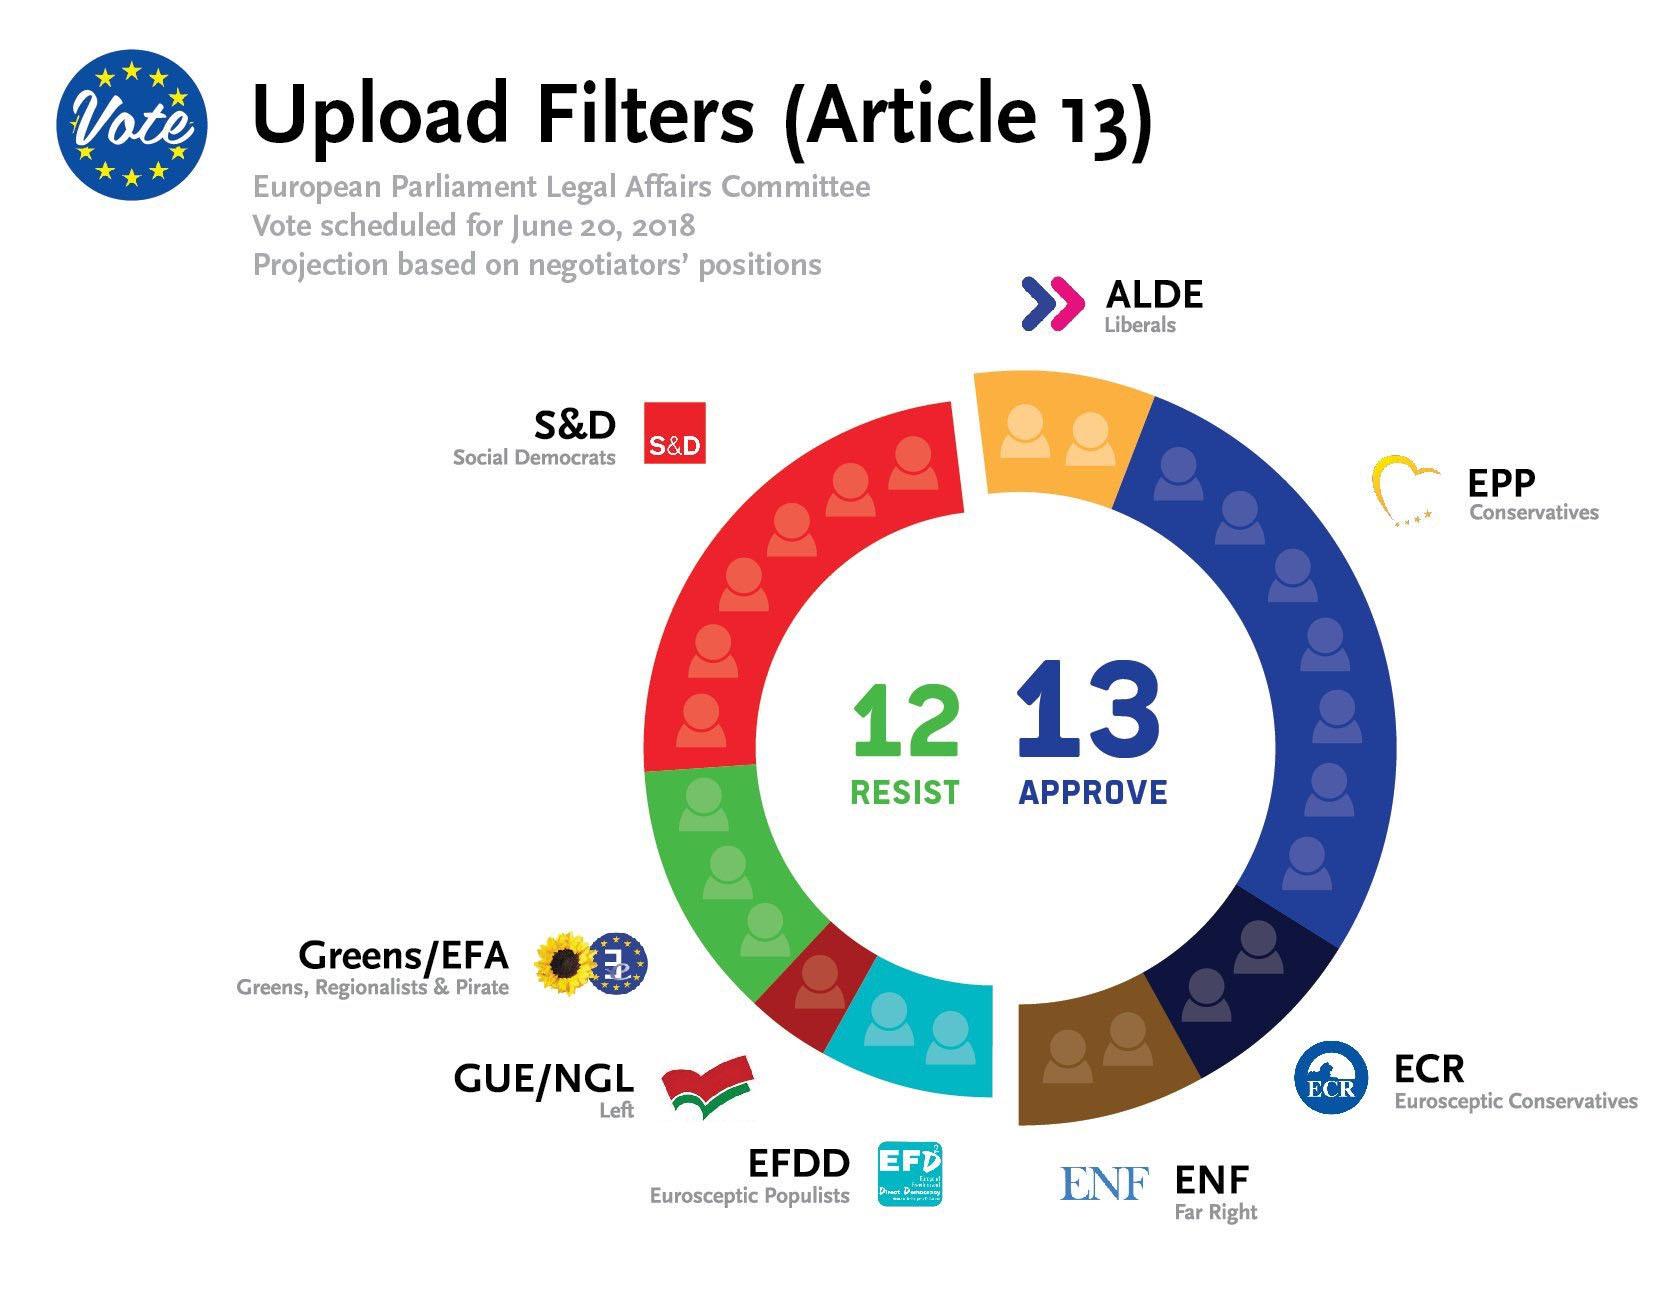 articulo 13 union europea copyright votacion